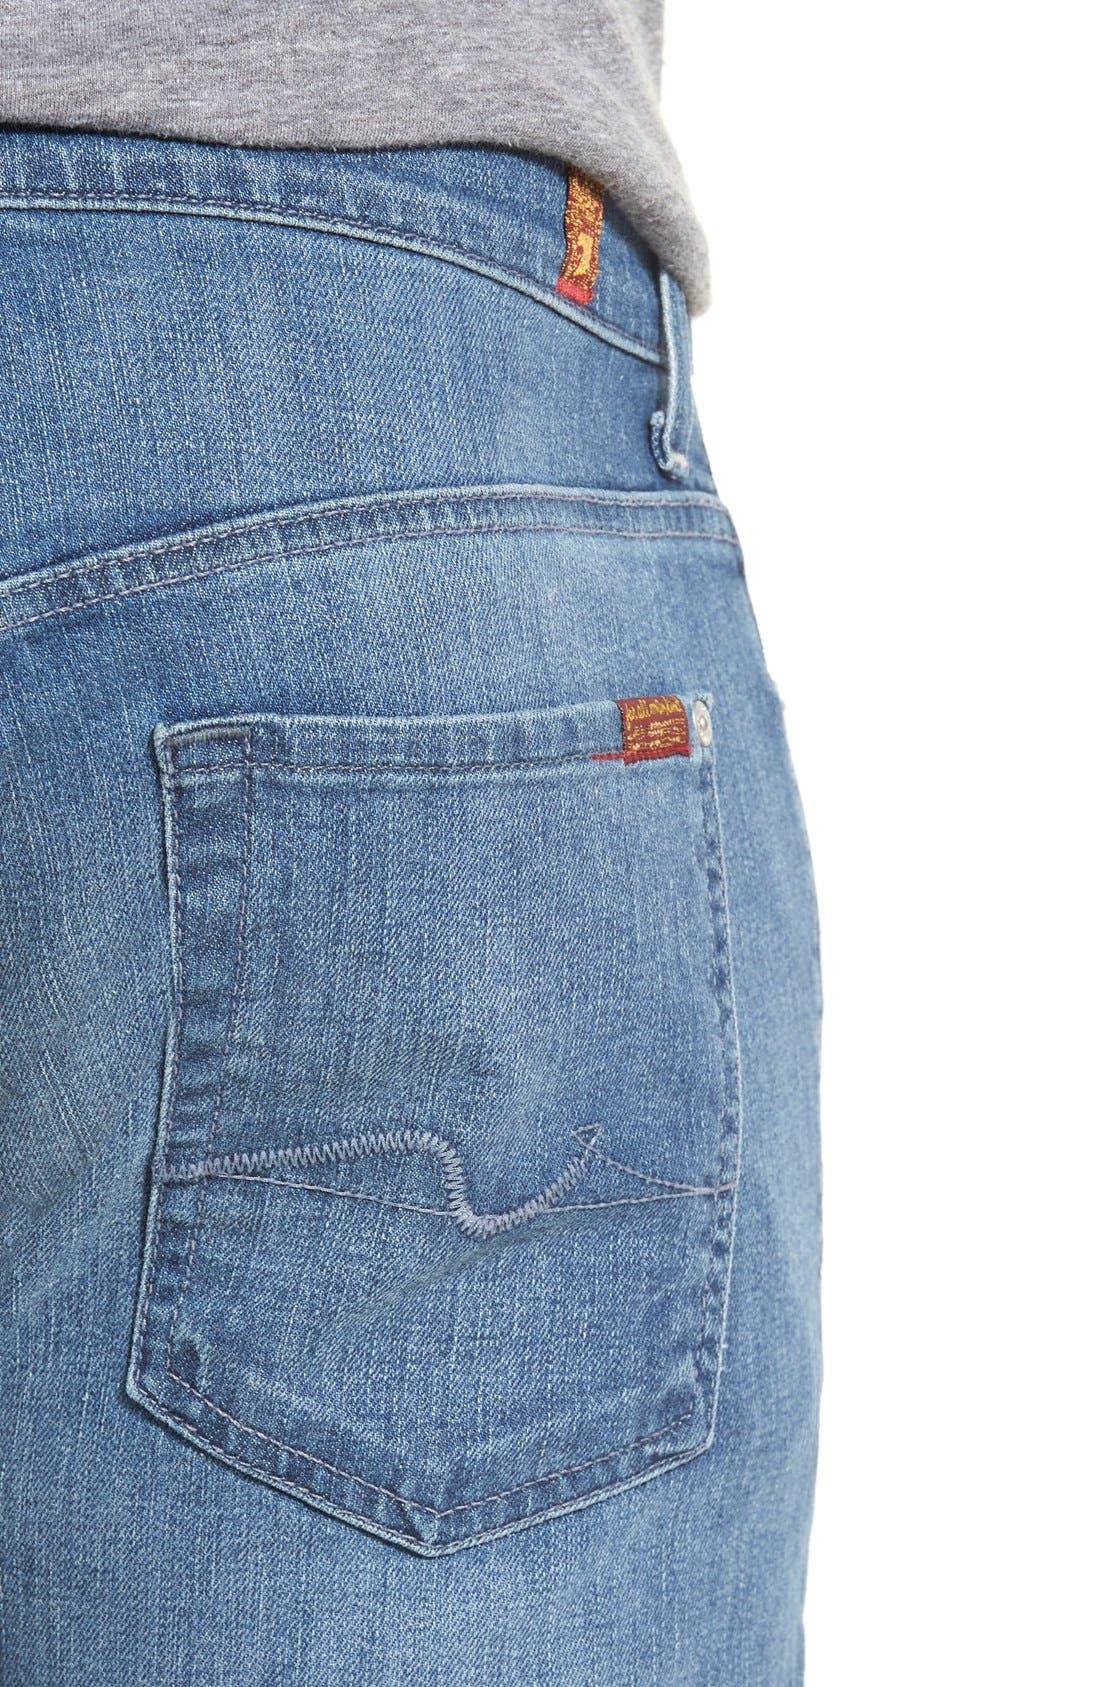 'Standard' Straight Leg Jeans,                             Alternate thumbnail 4, color,                             Marrakech